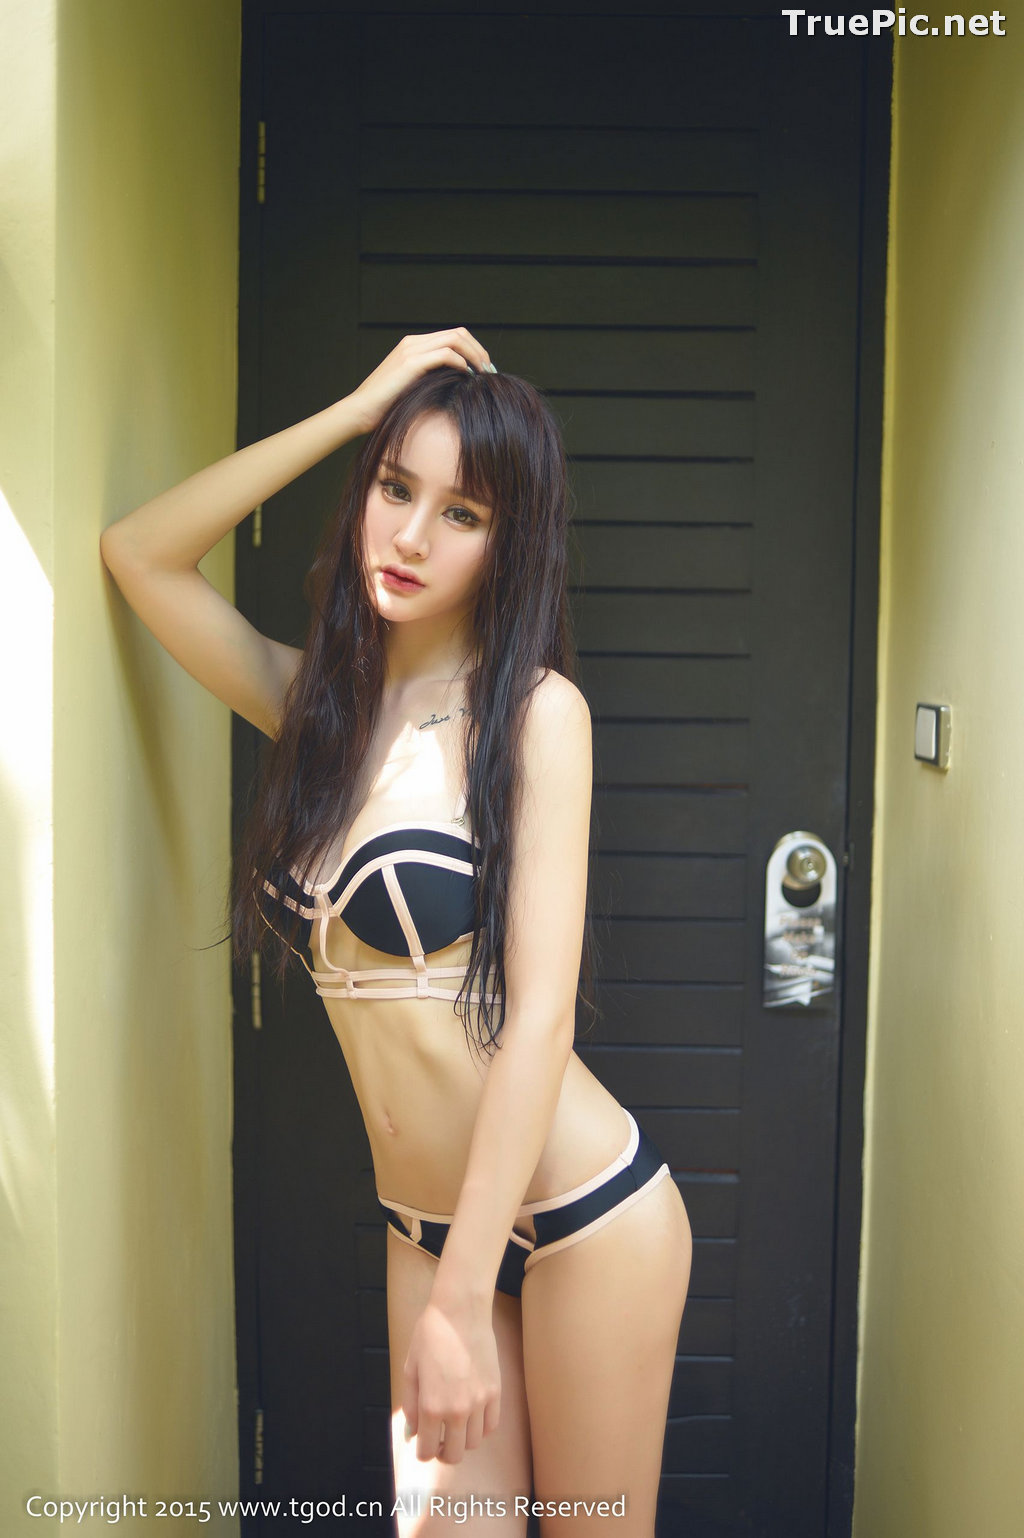 Image TGOD 2015-11-10 - Chinese Sexy Model - Cheryl (青树) - TruePic.net - Picture-30